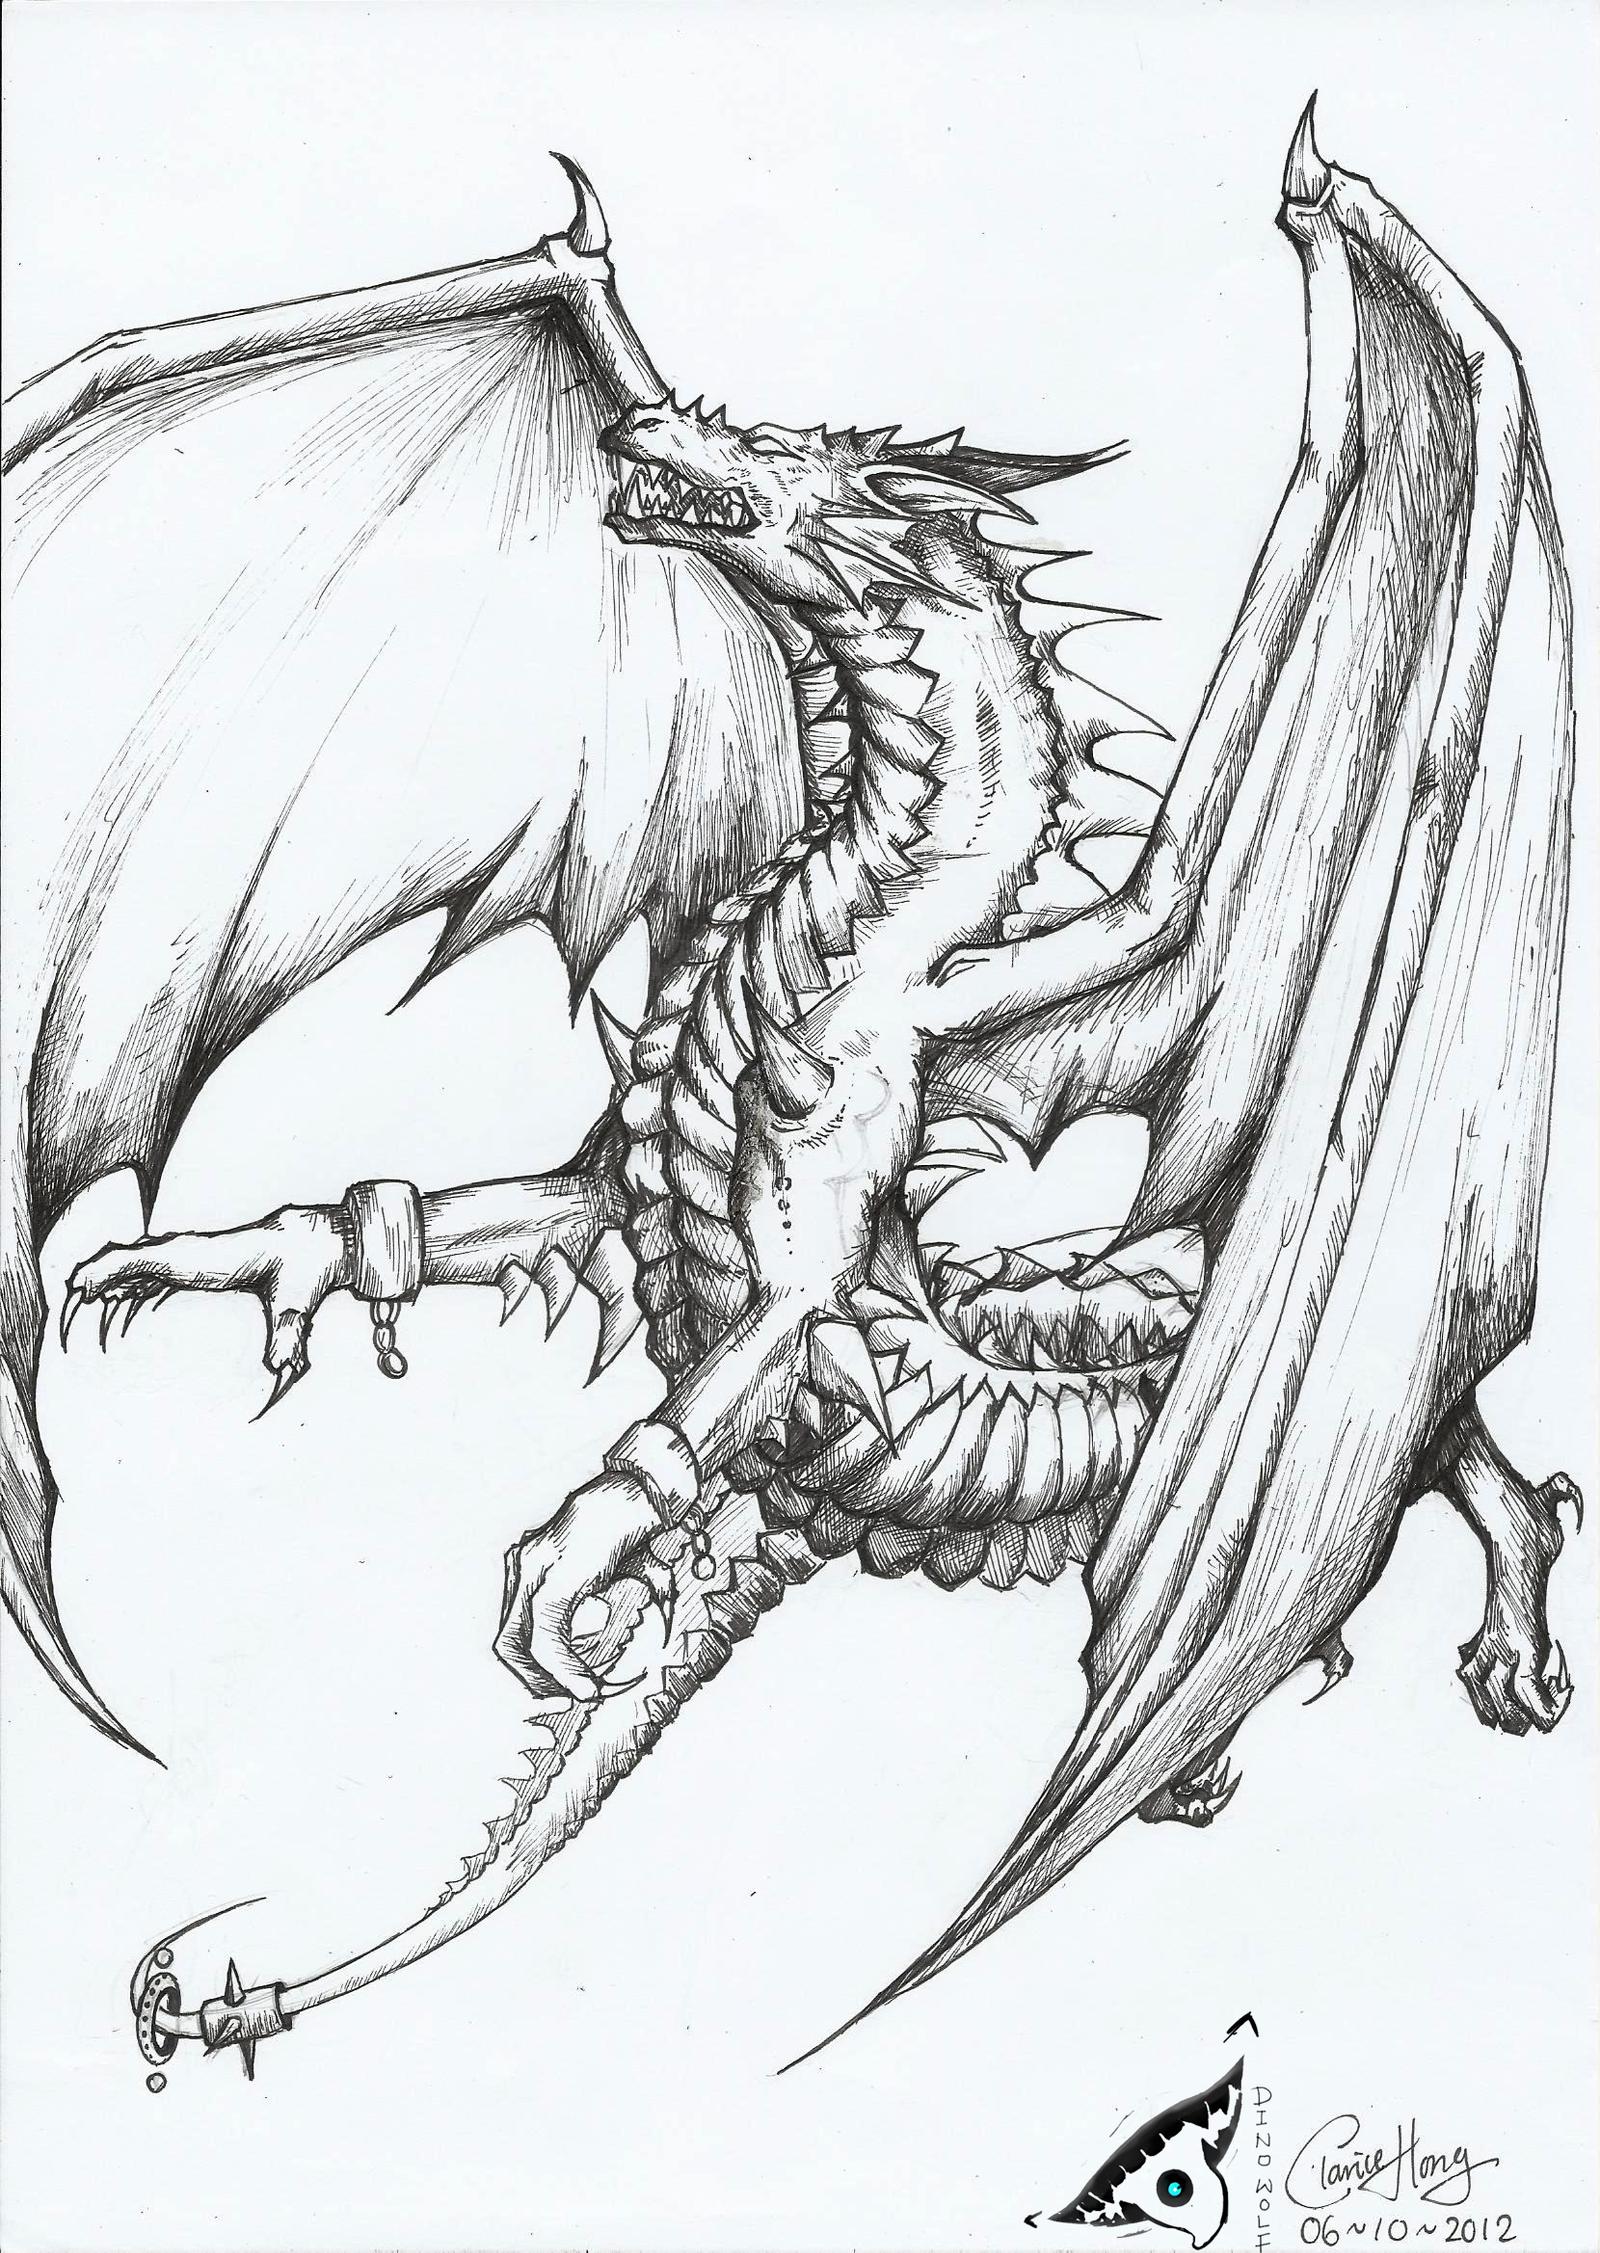 The Dragon - Caligo by dino-wolf on DeviantArt